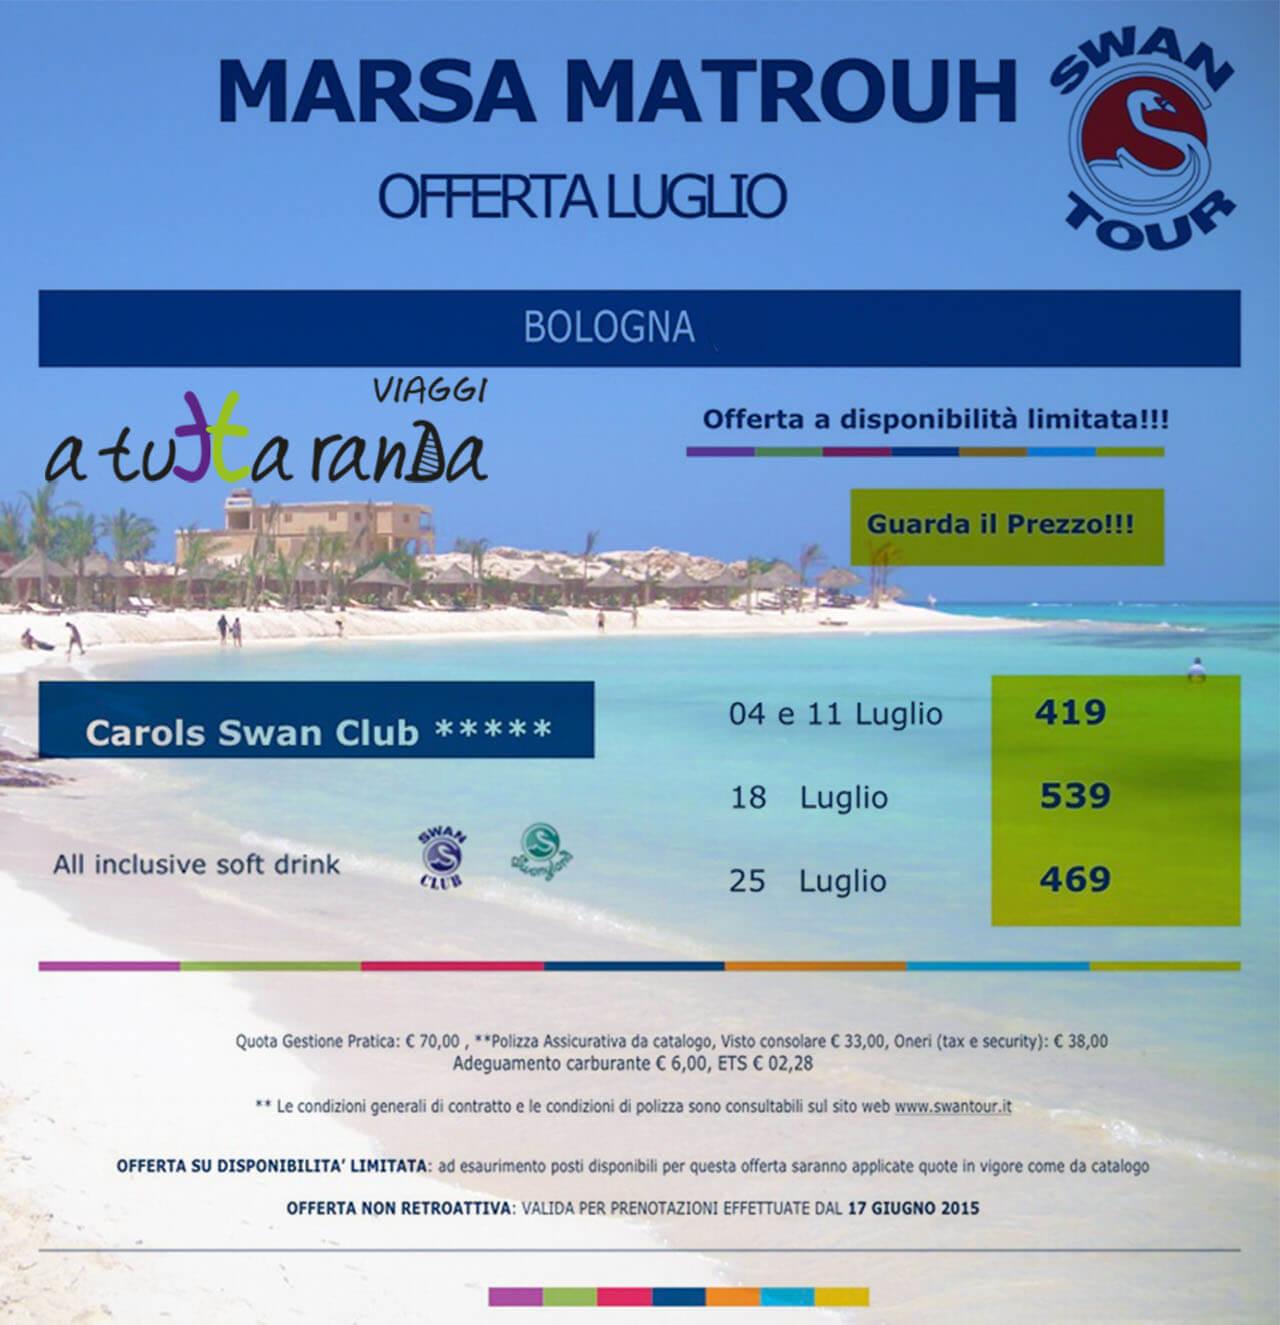 Marsa Matrouh